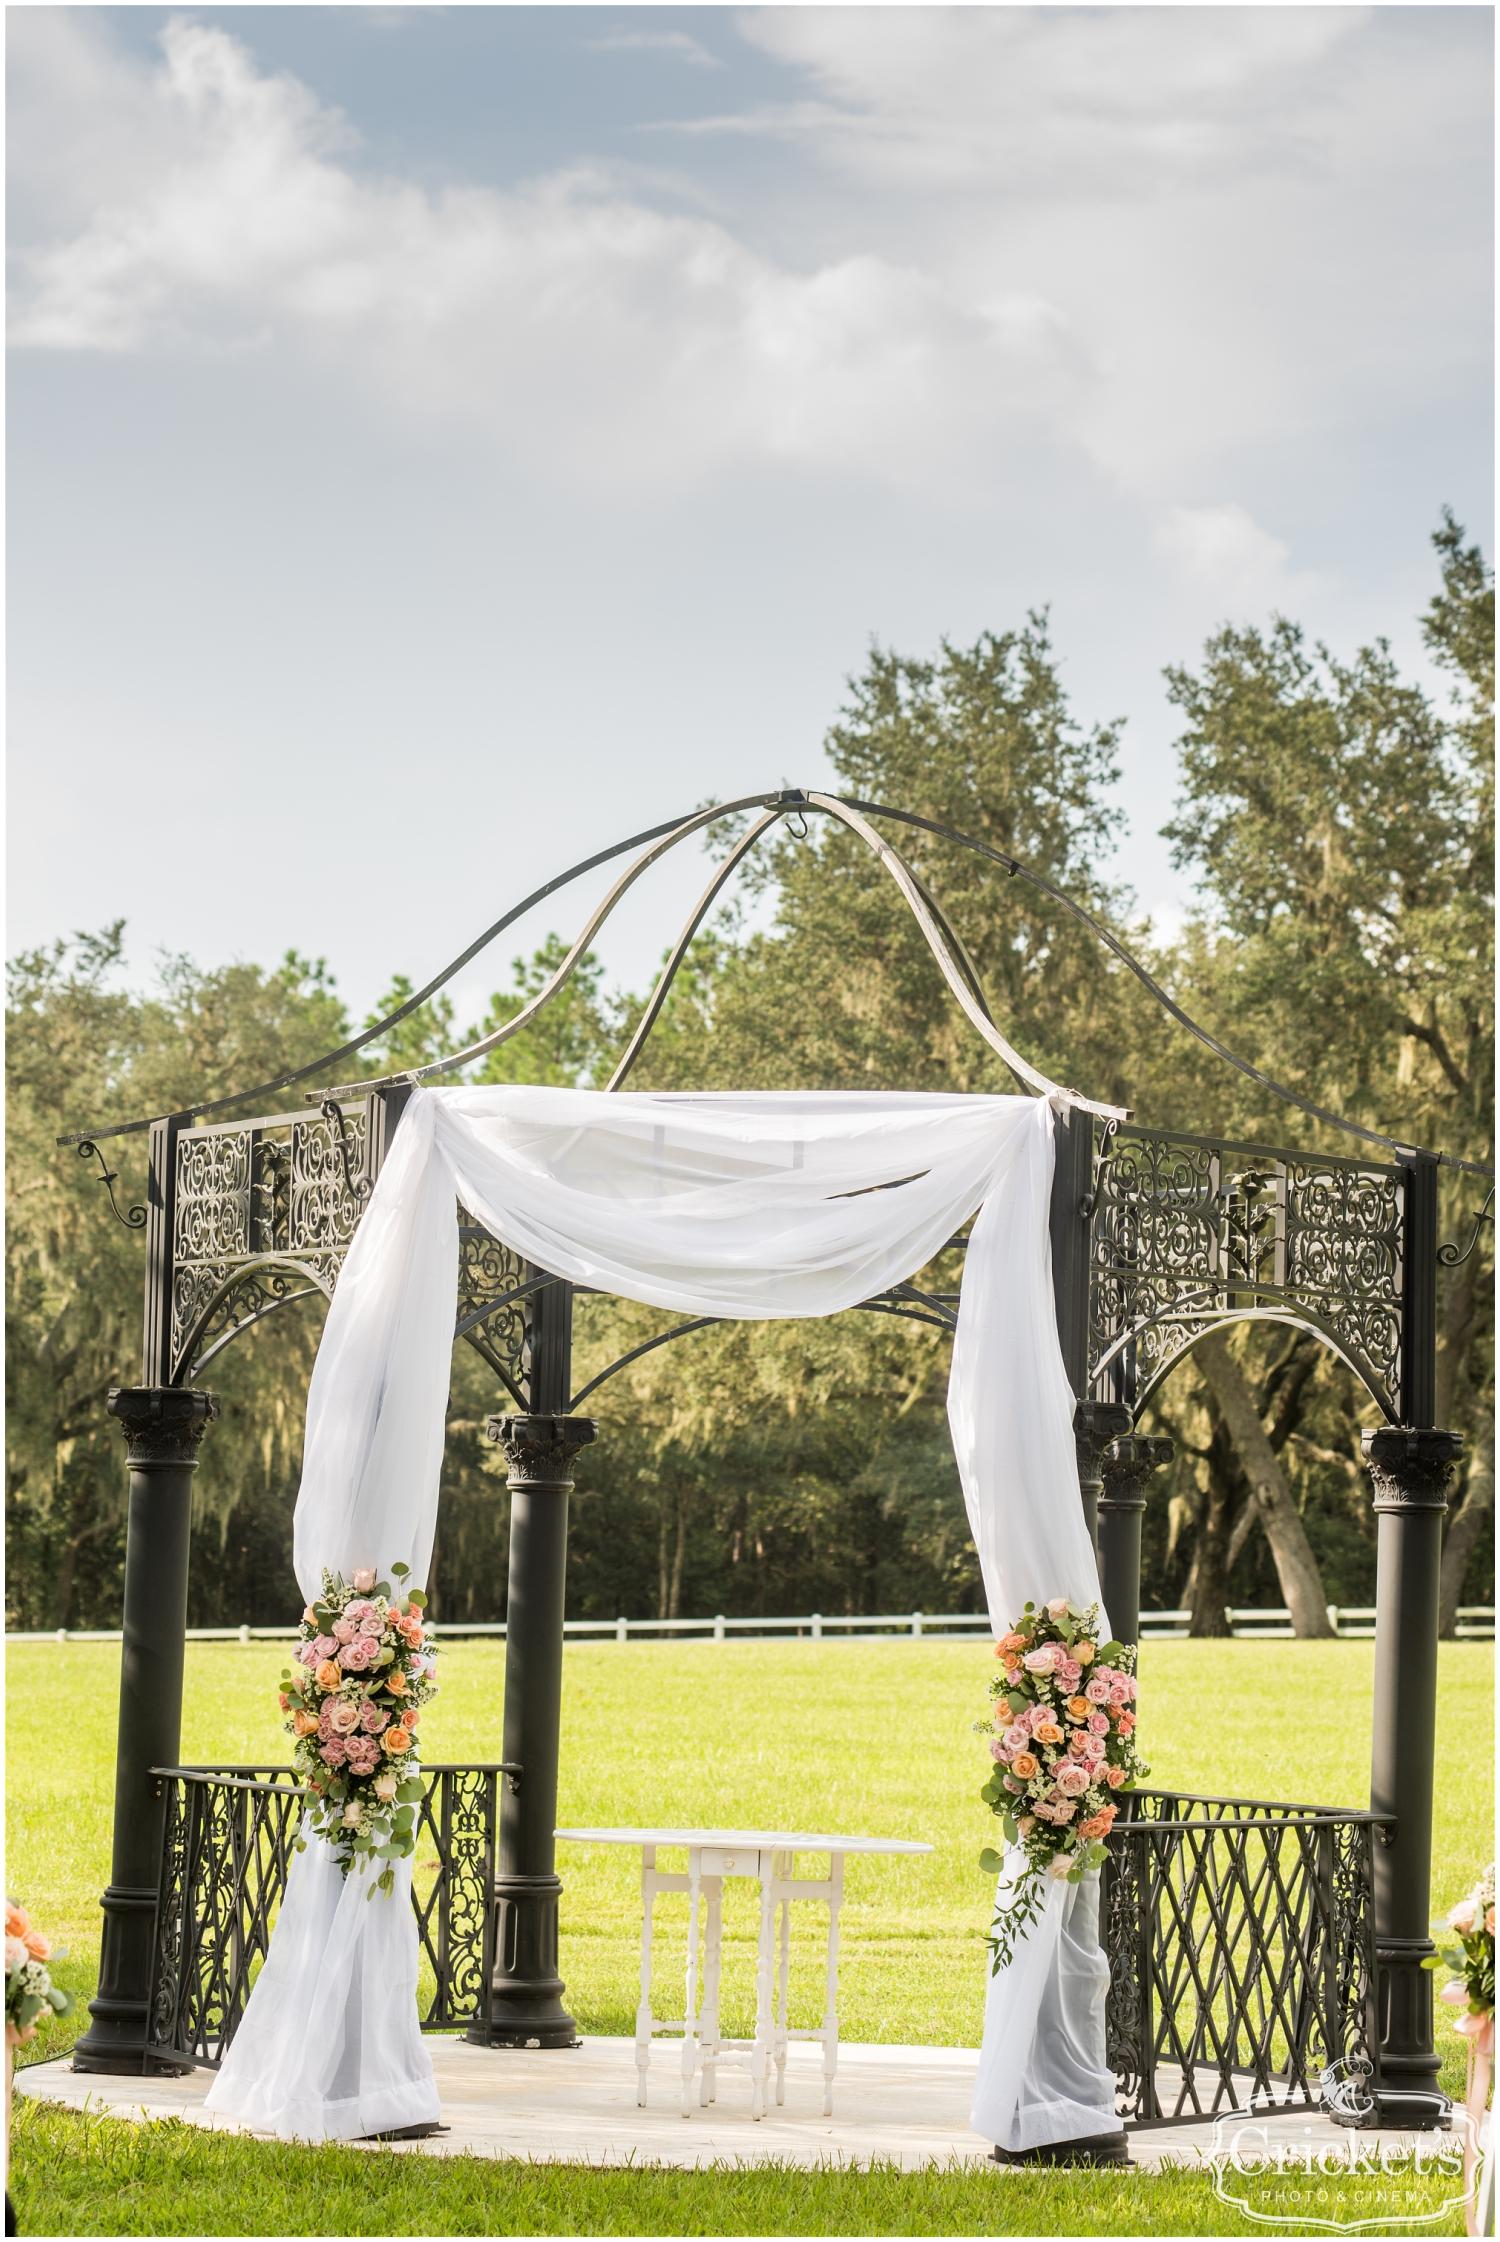 Wedding arch inspiration